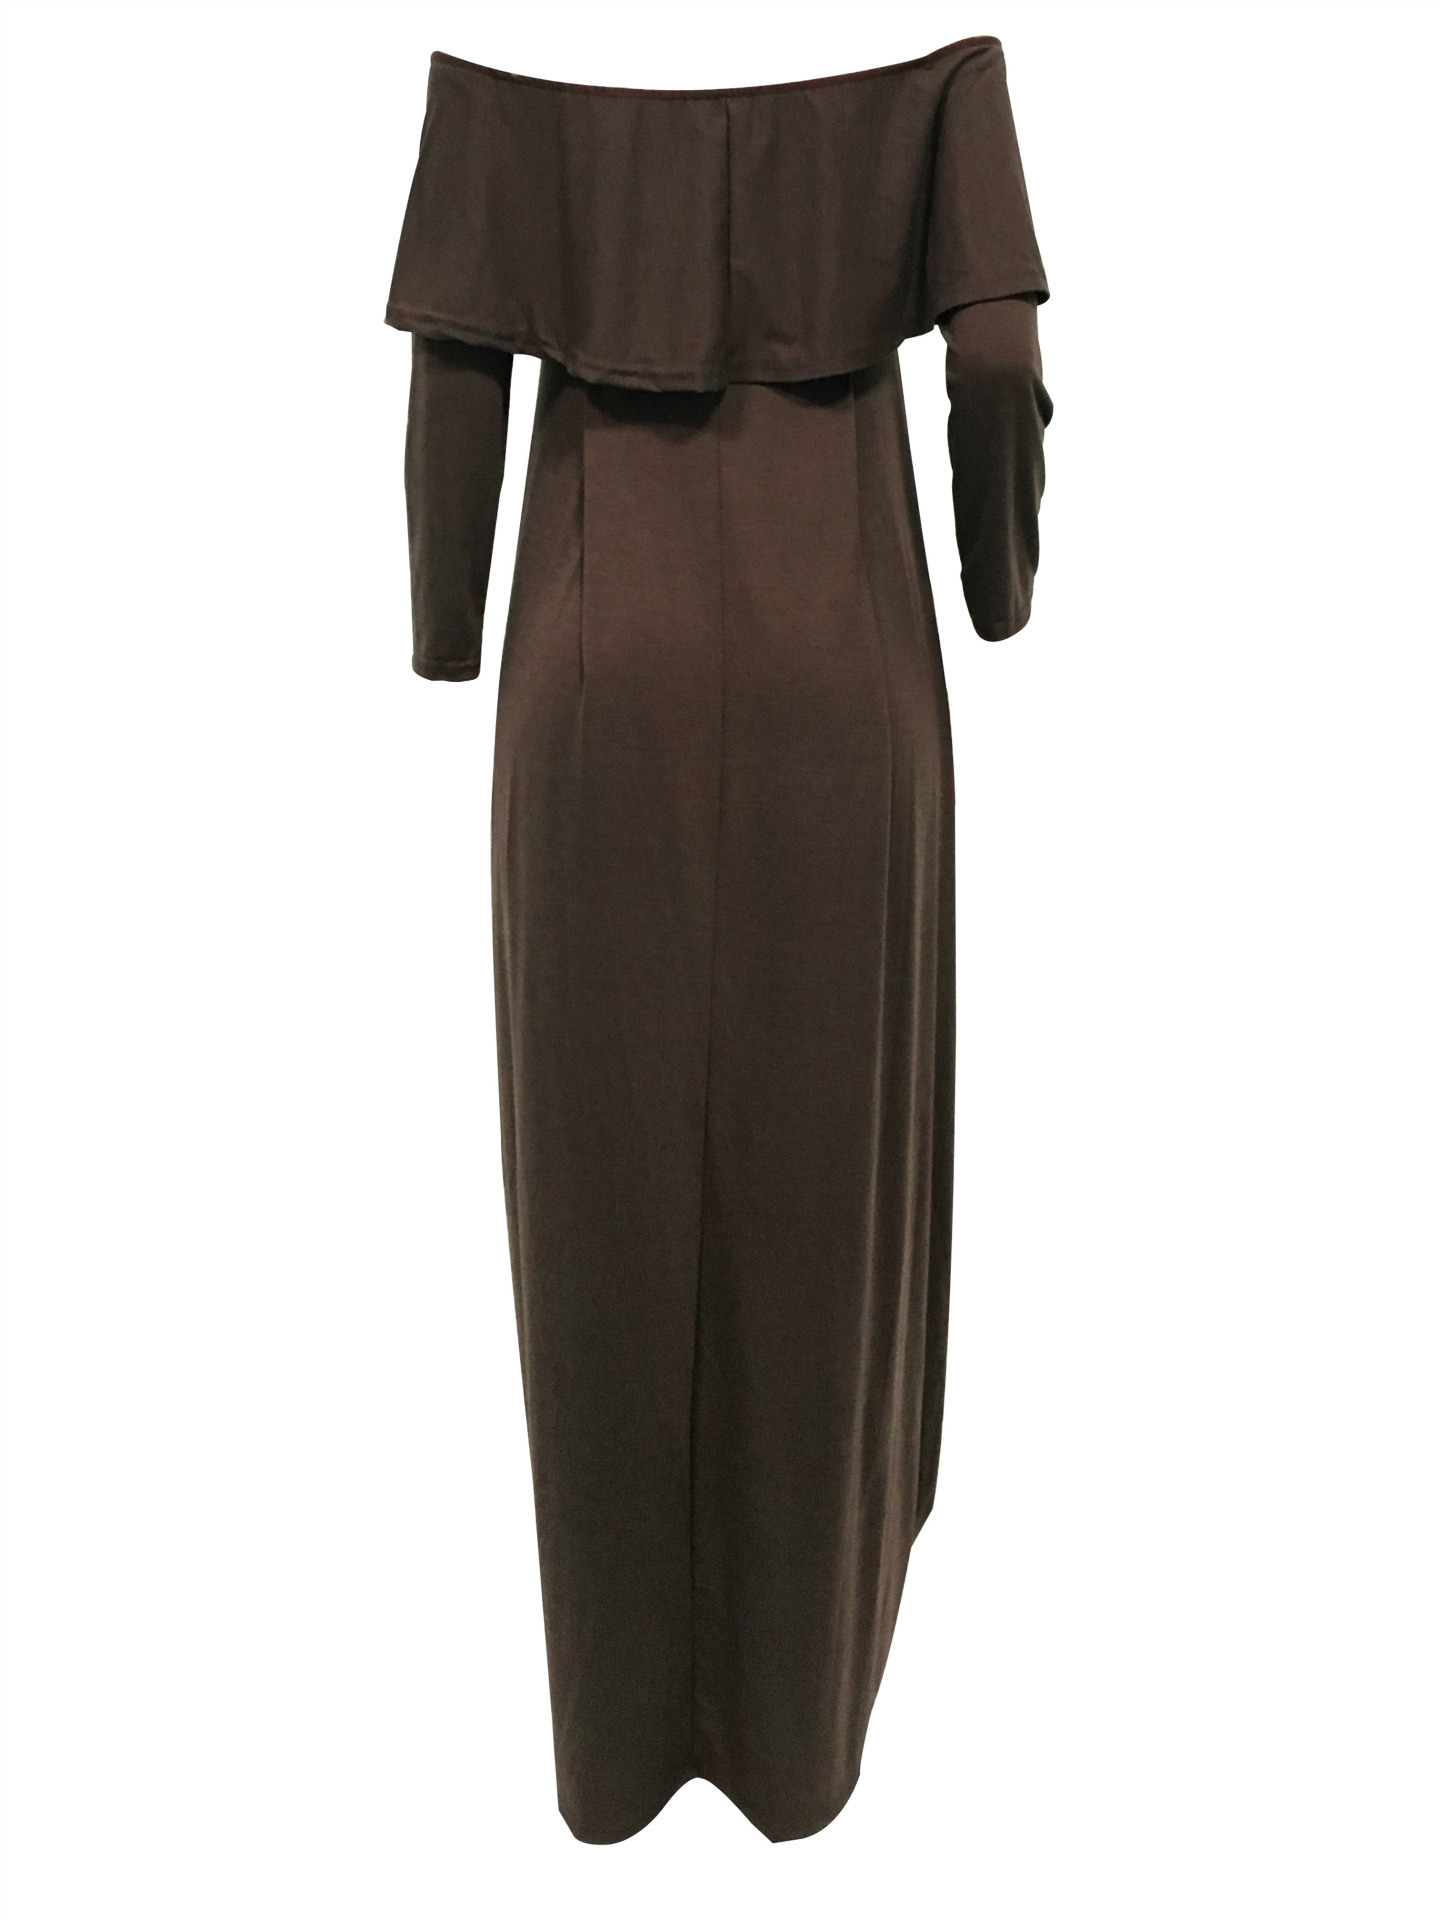 Mode Tau Schulter Falbala Design Grau-grün Baumwolle Blend Knöchel Länge Kleid